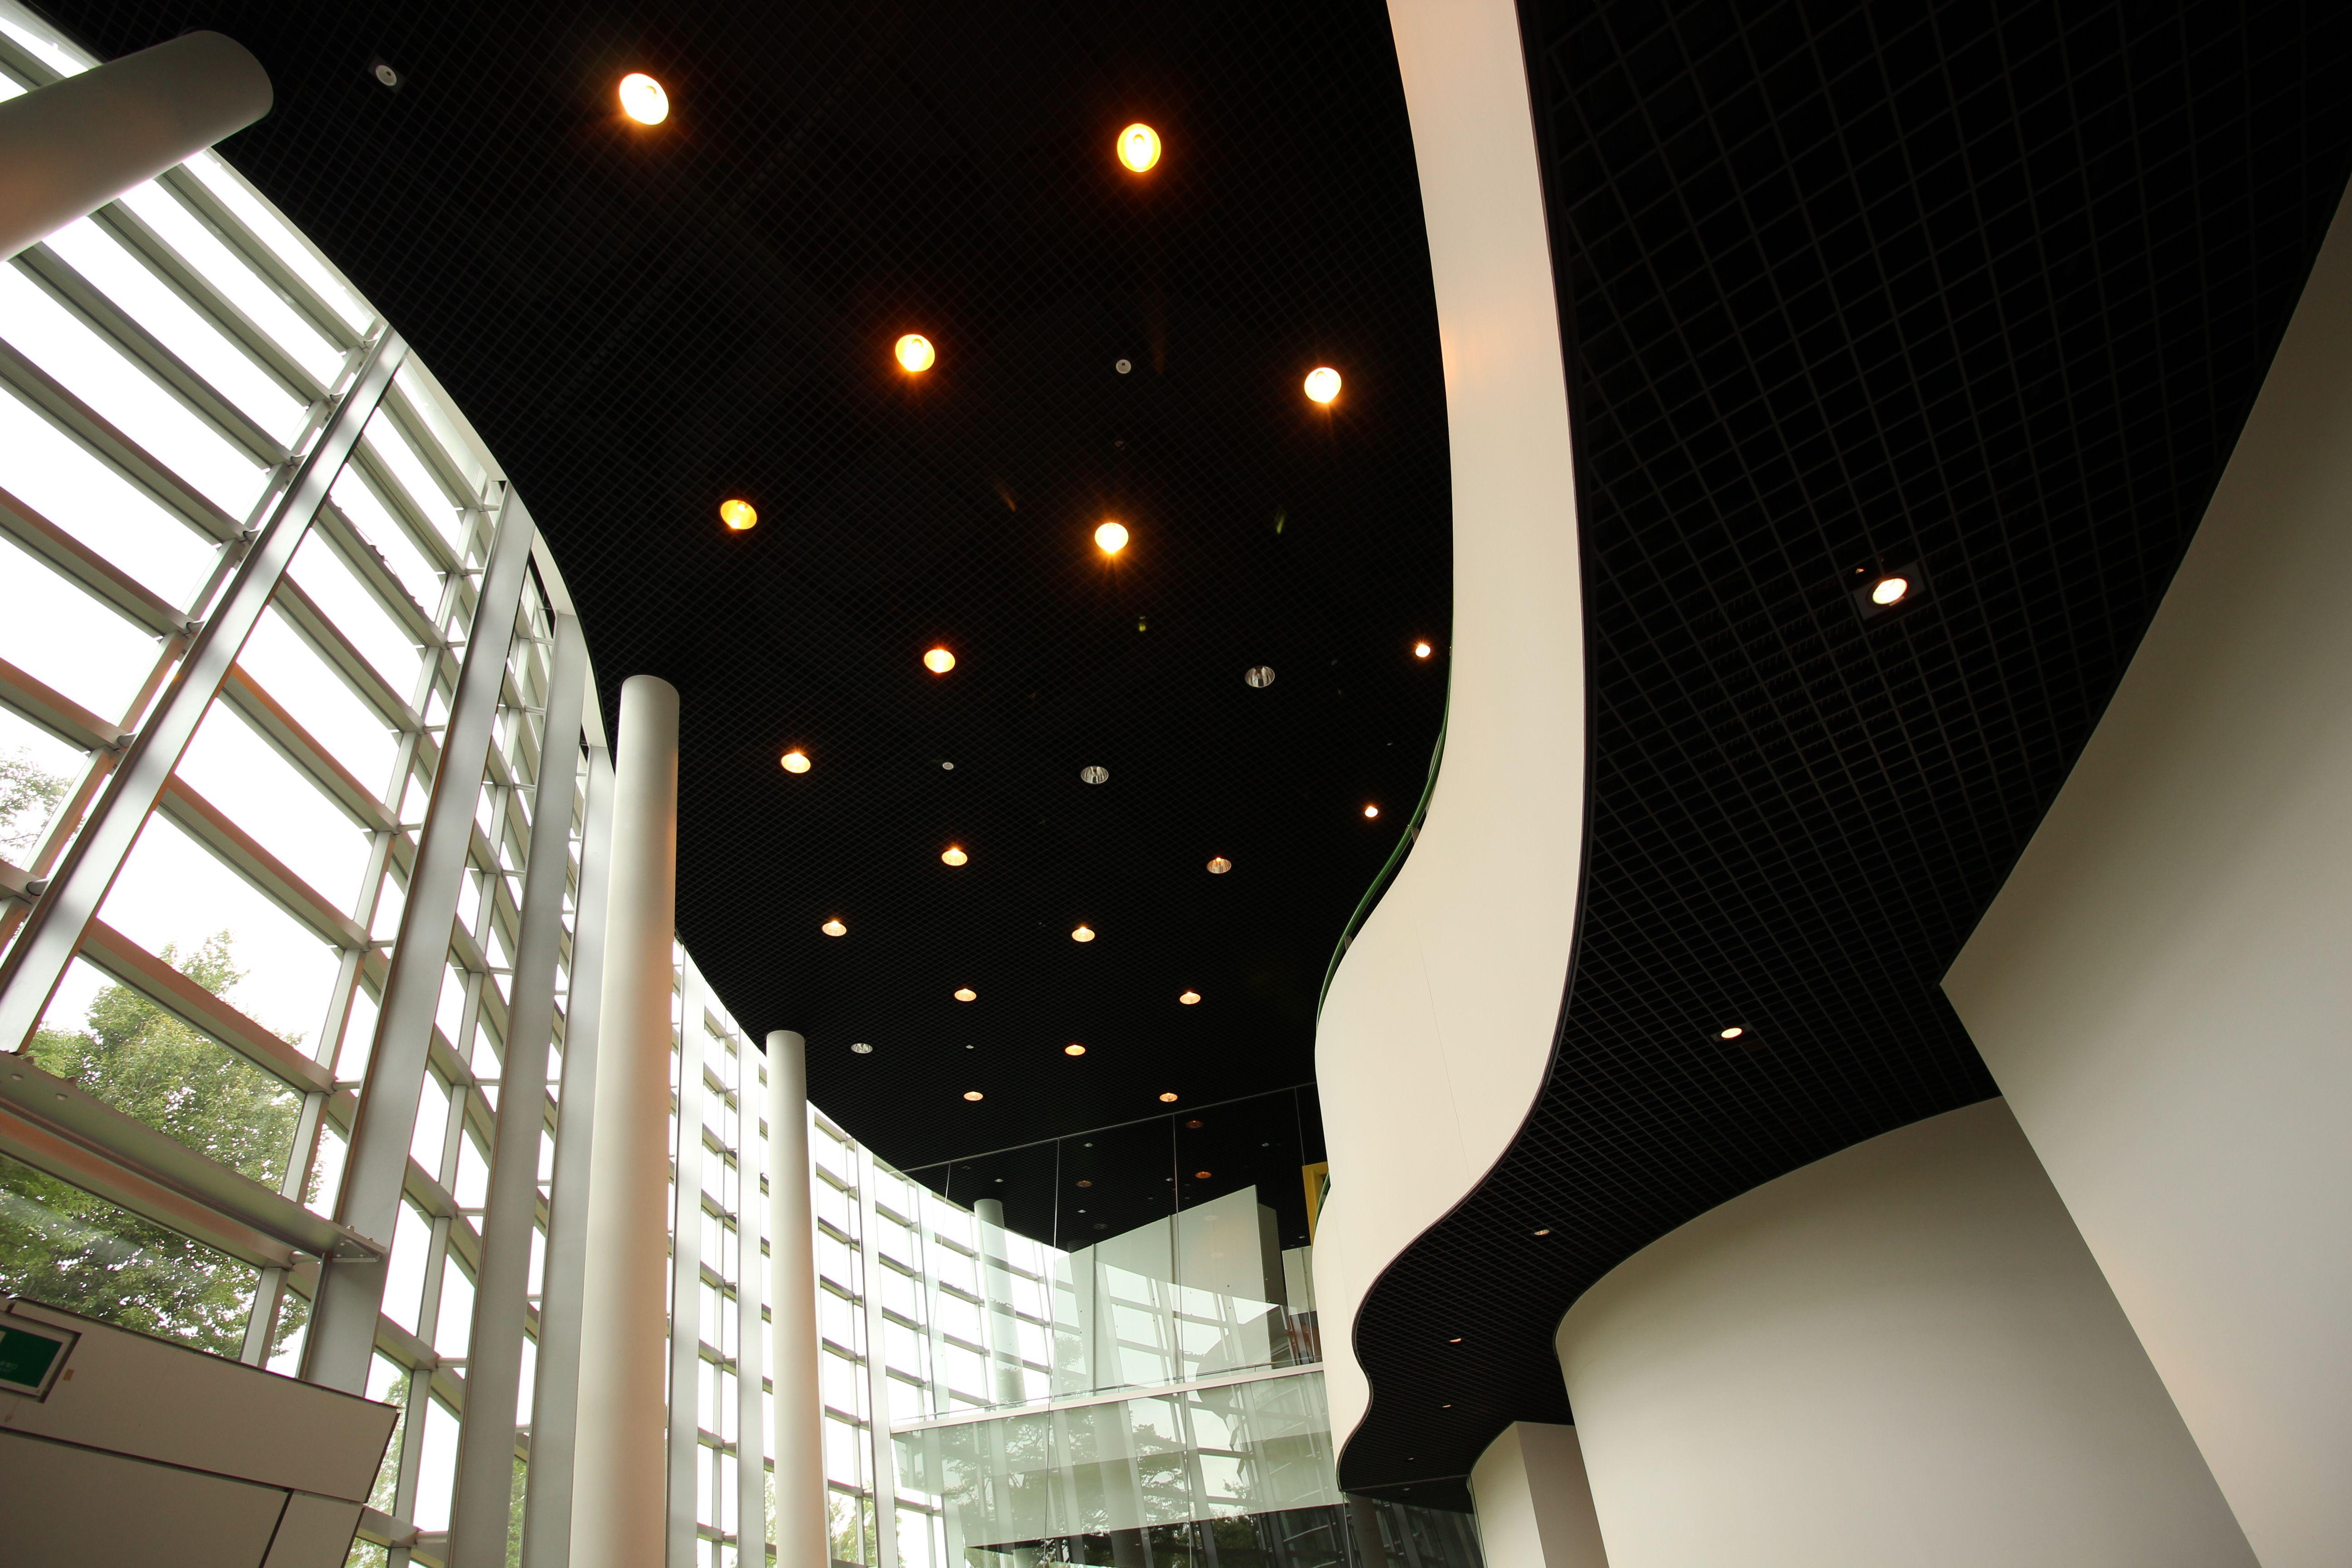 福井市美術館 FUKUI CITY ART MUSEUM